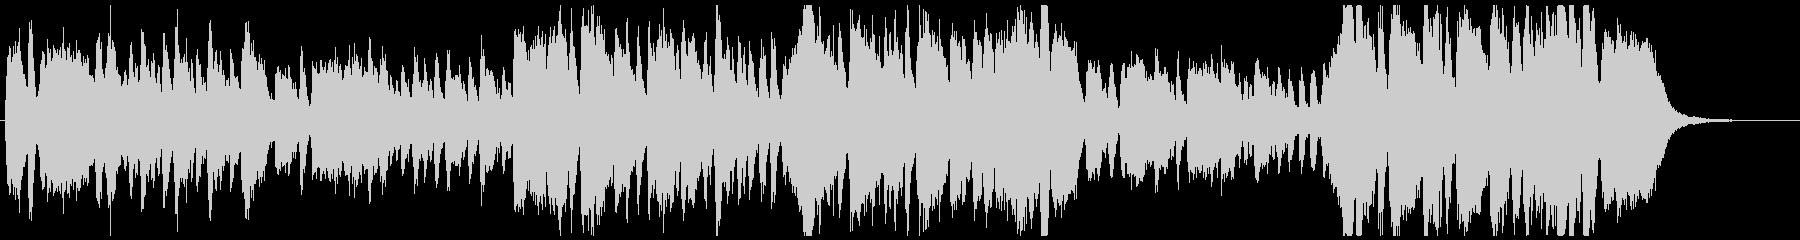 BWV1067/6『メヌエット』バッハの未再生の波形